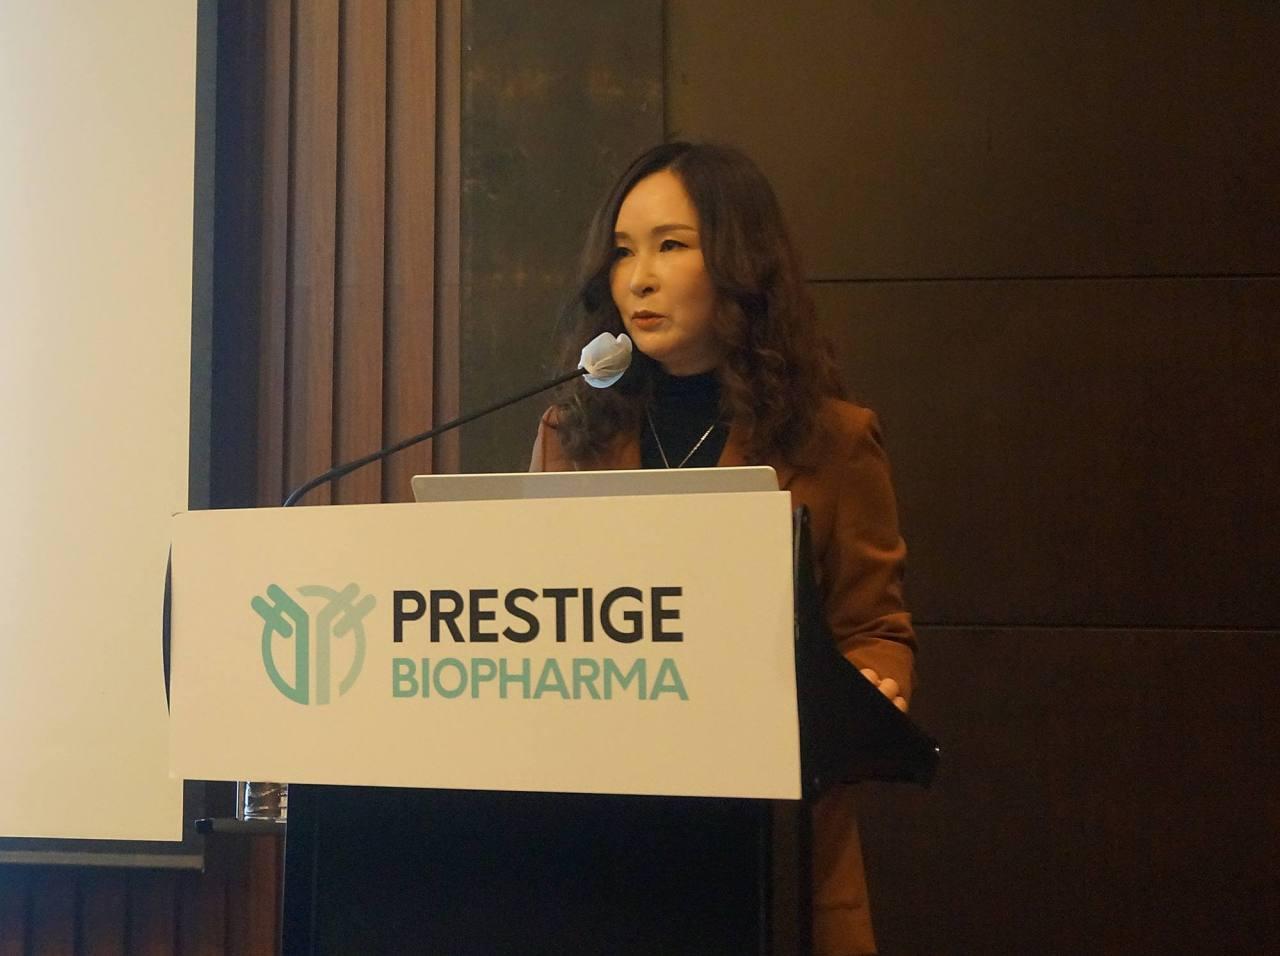 Prestige Biopharma CEO Park So-yeon speaks at a briefing held in Seoul on Monday. (Prestige Biopharma)